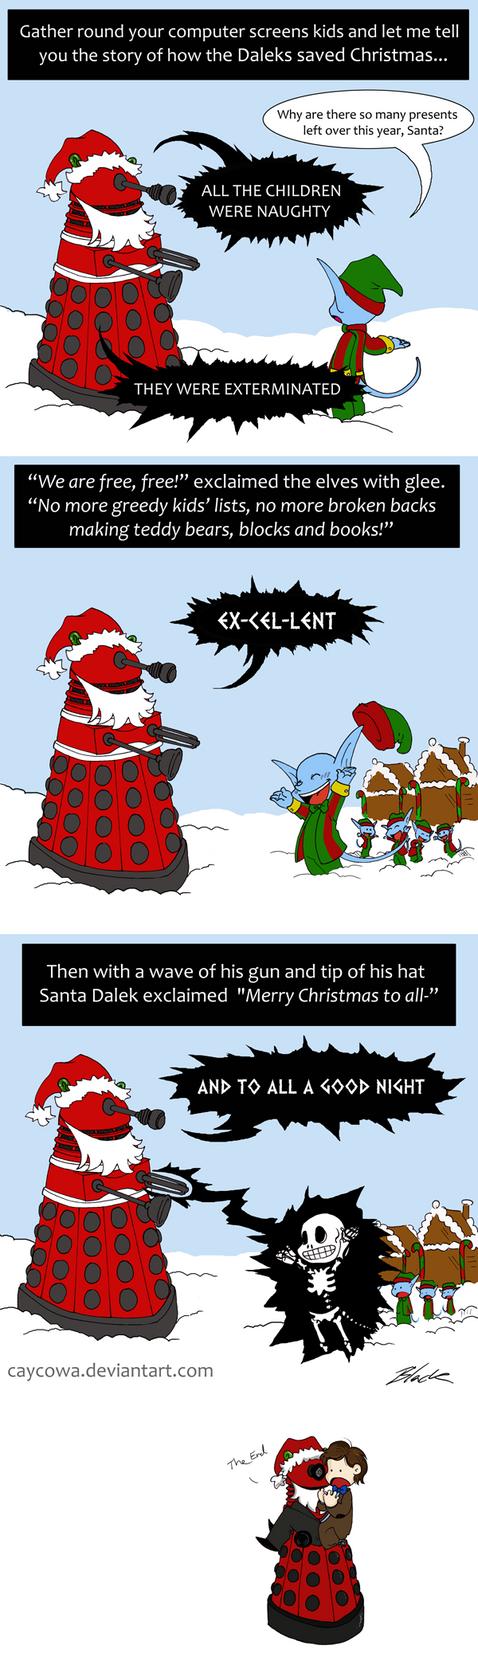 How the Daleks saved Christmas by caycowa